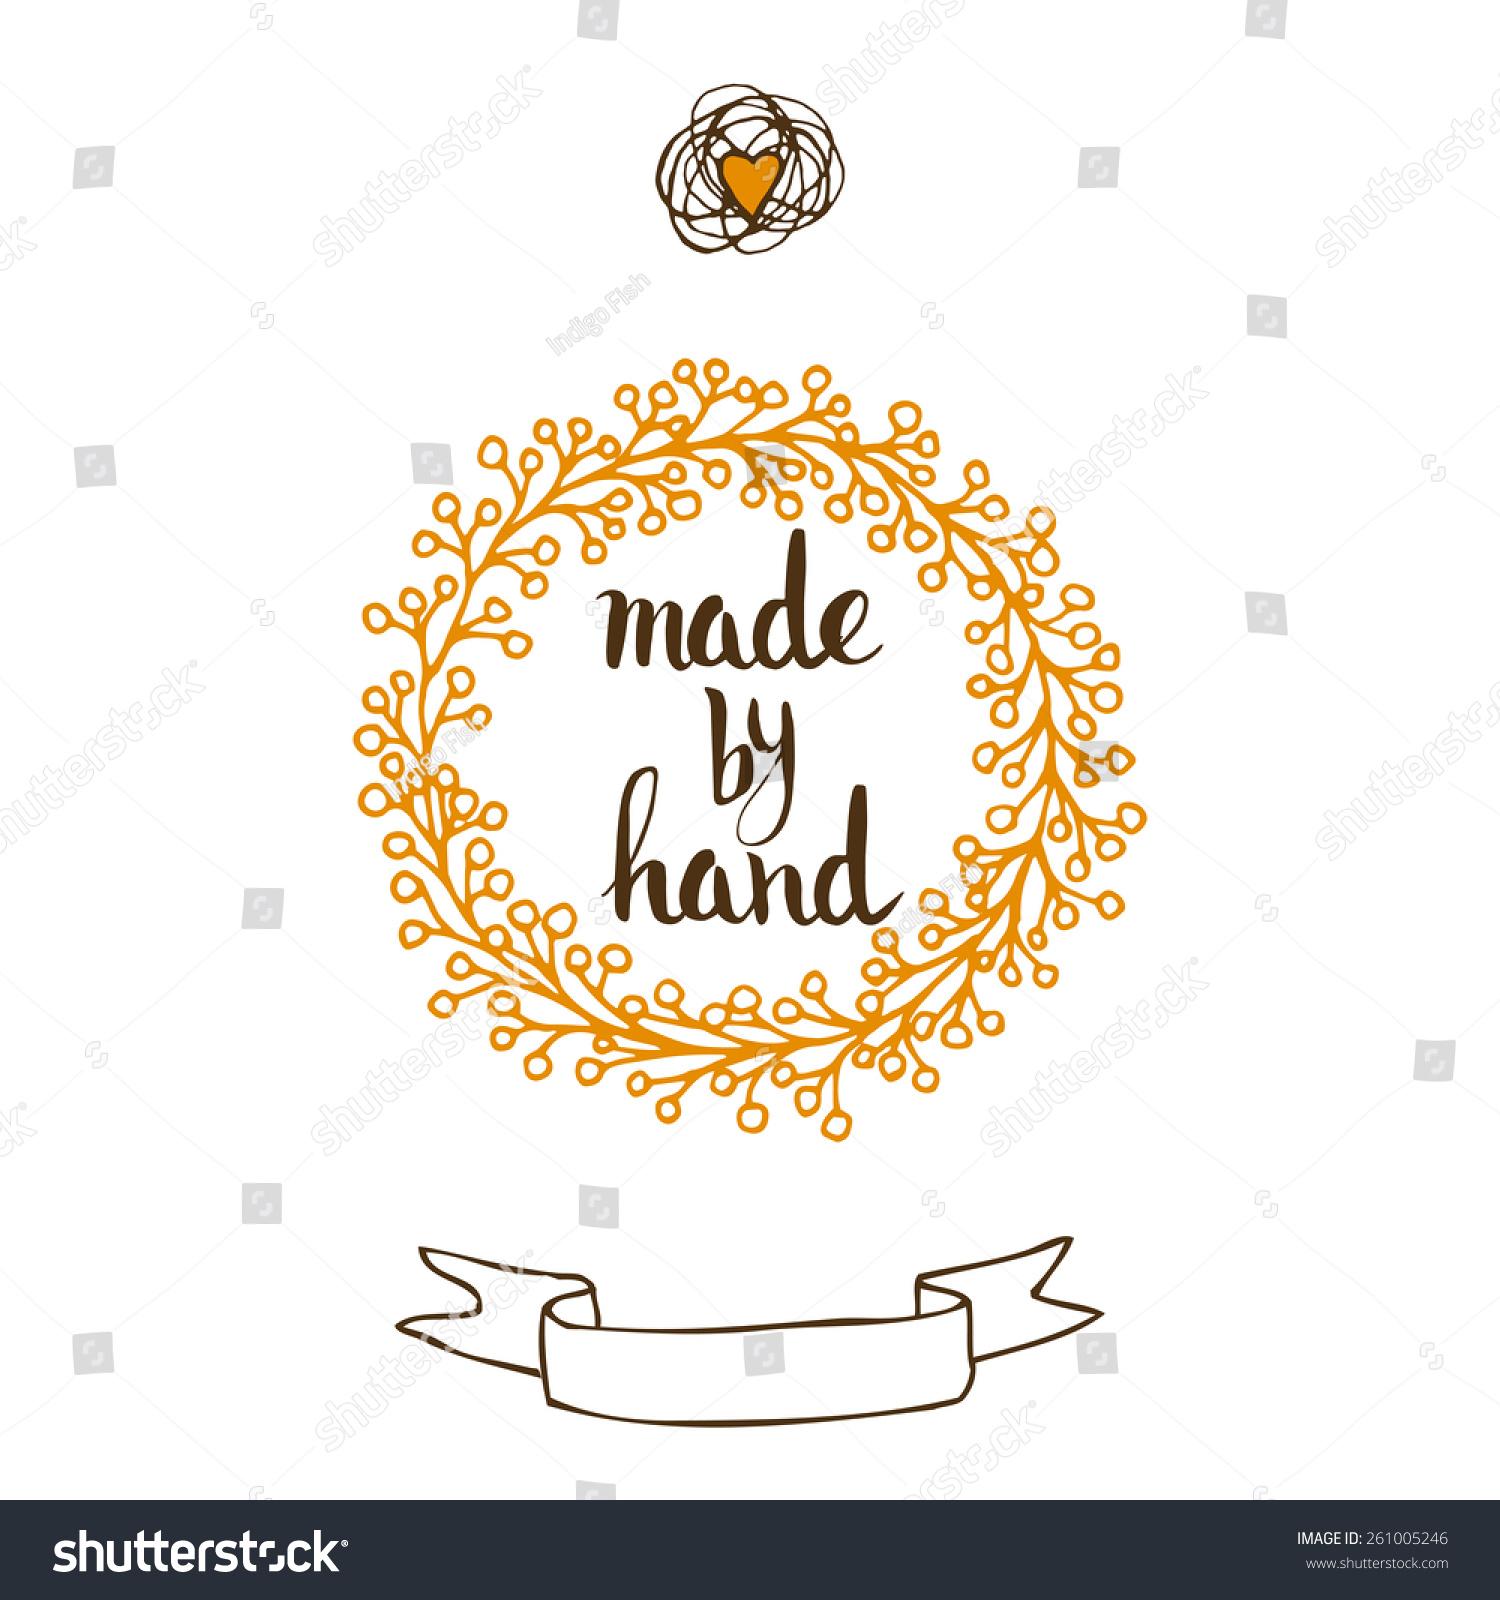 Handmade original custom hand lettering stock